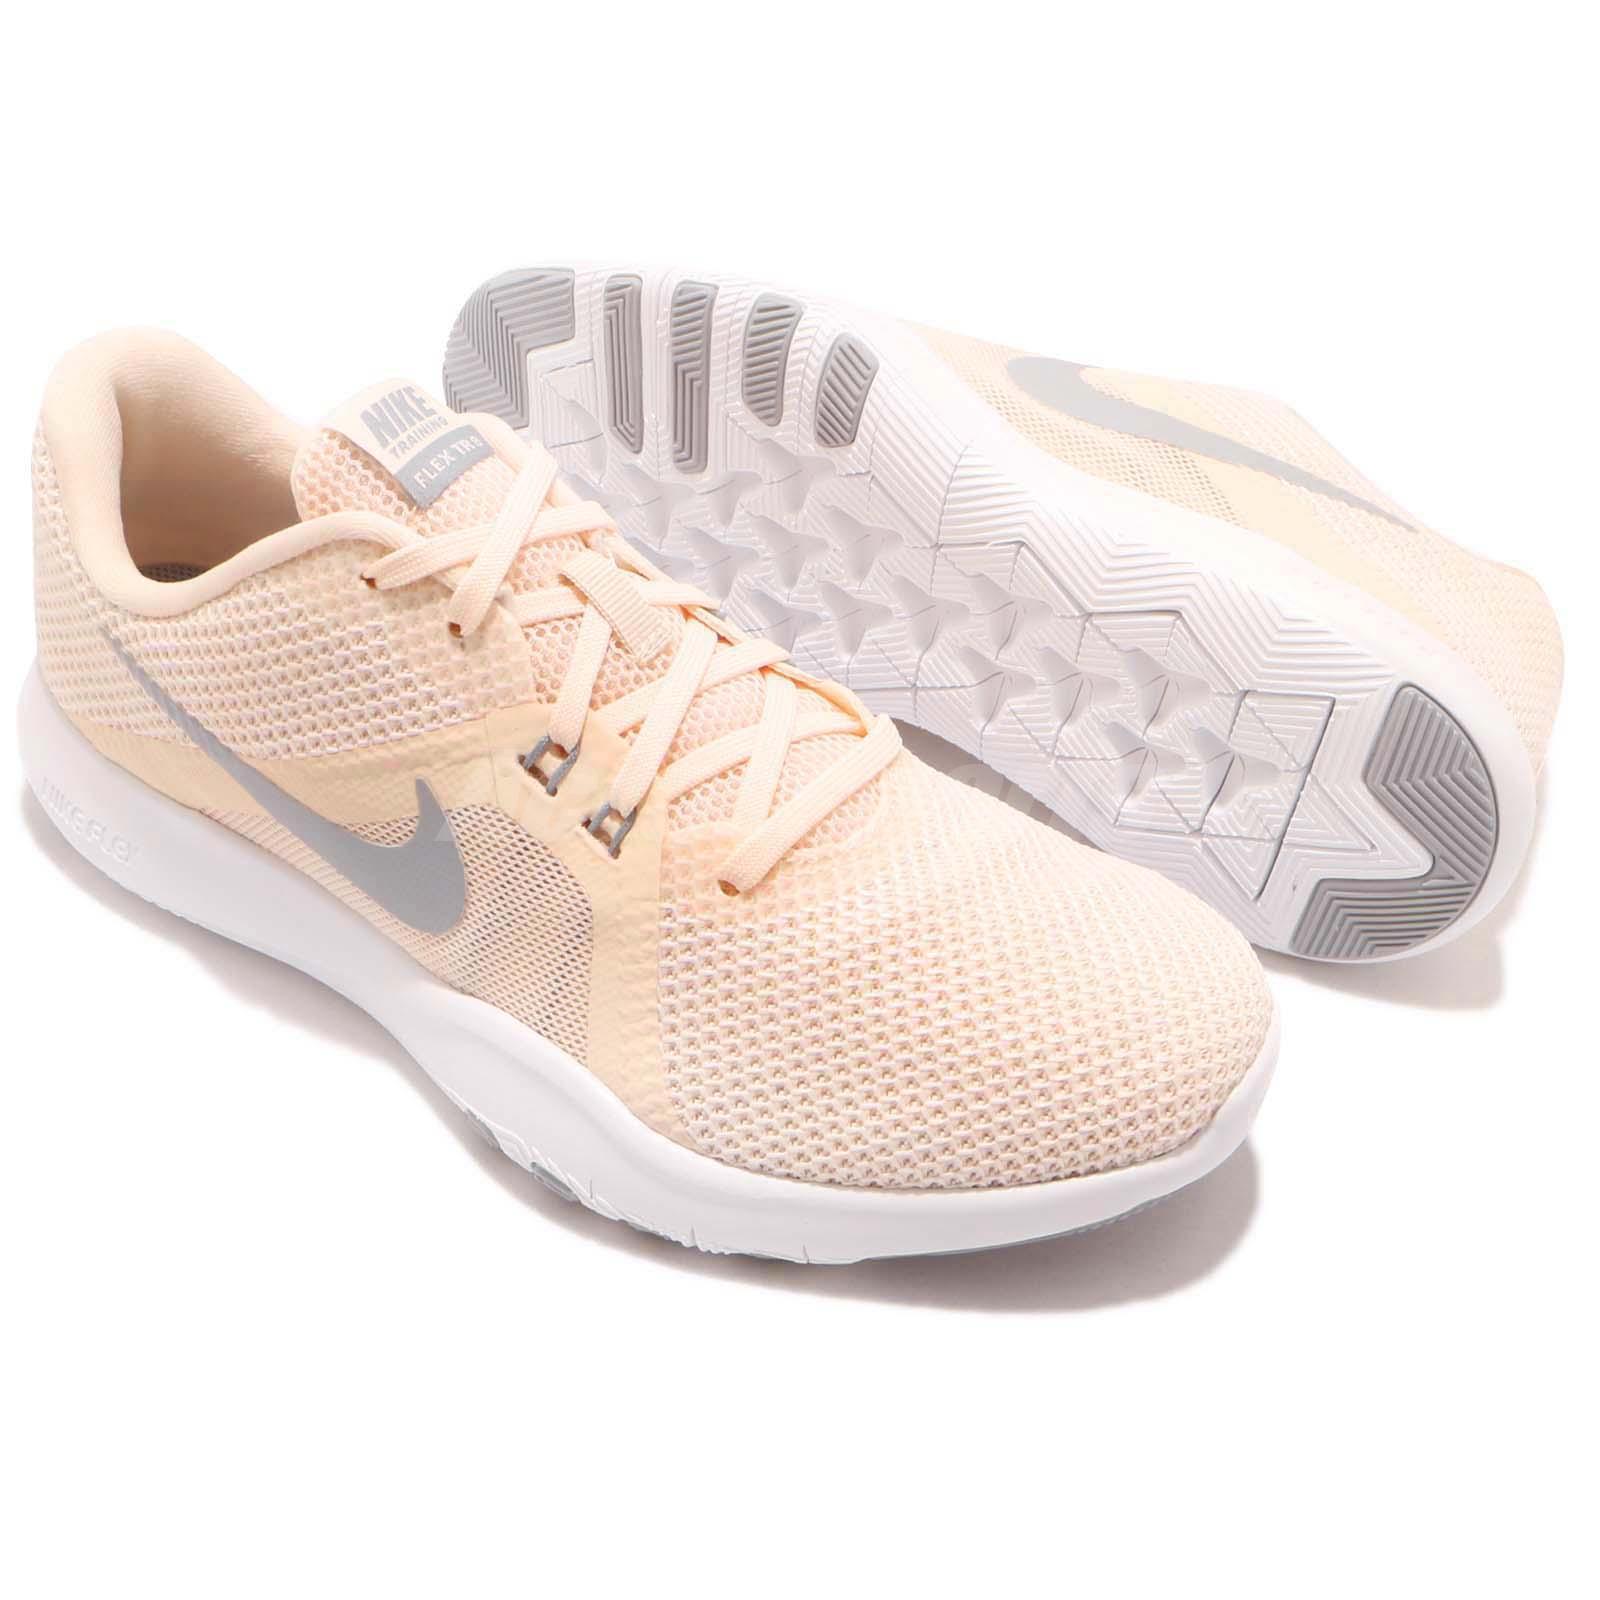 e3ec13faa03a Nike Wmns Flex Trainer 8 VIII Guava Ice Grey Women Cross Training ...